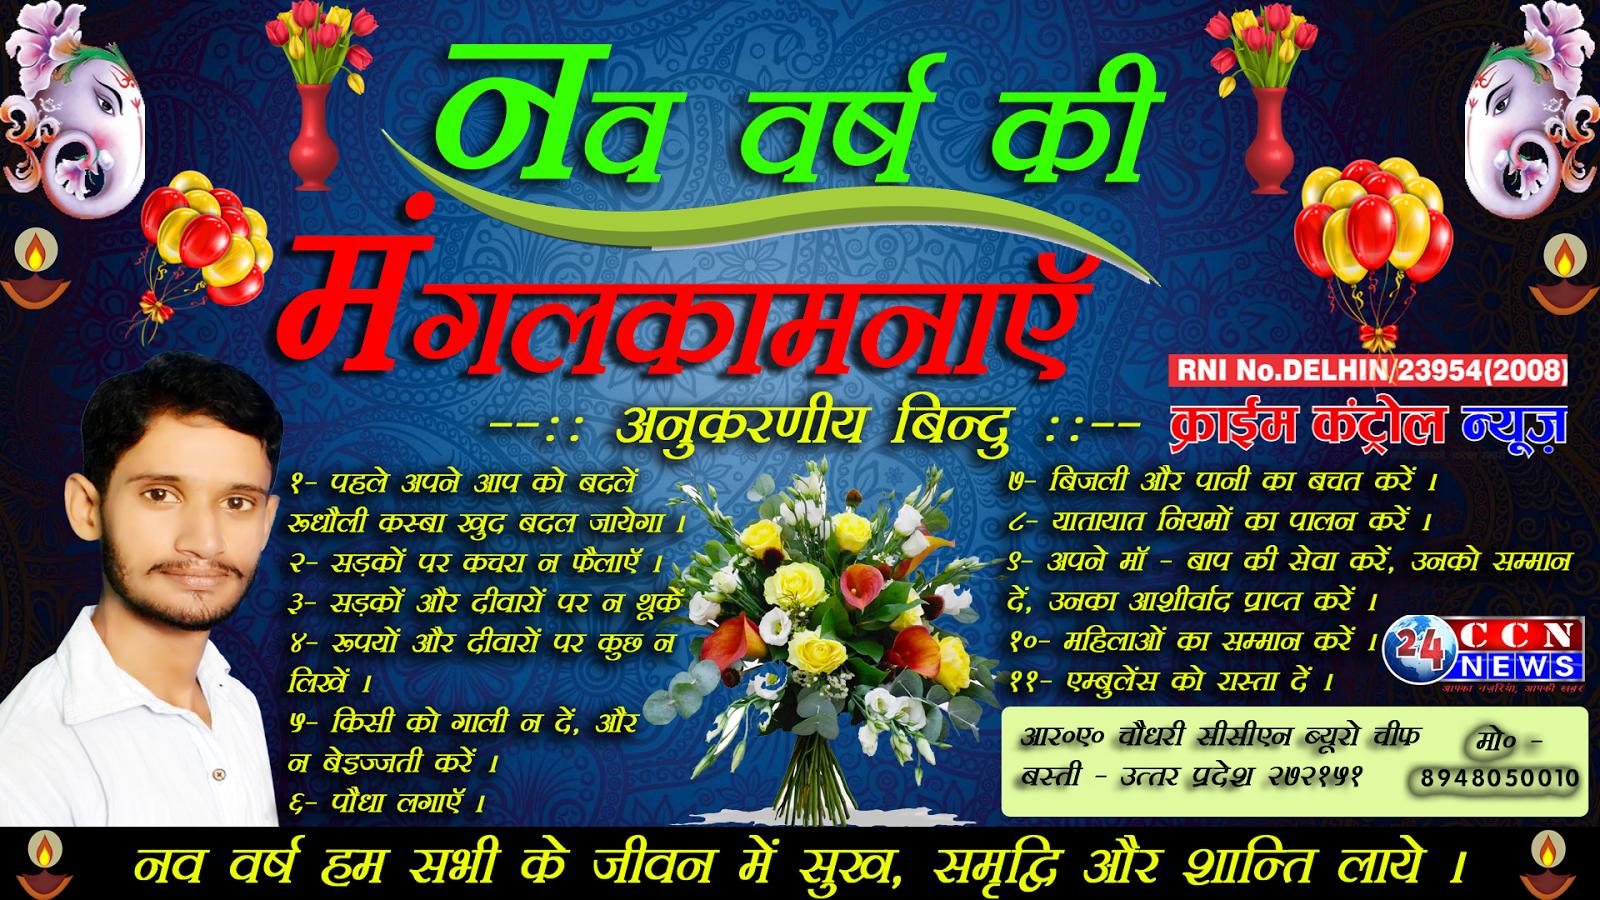 Rajan Chaudhary New Year